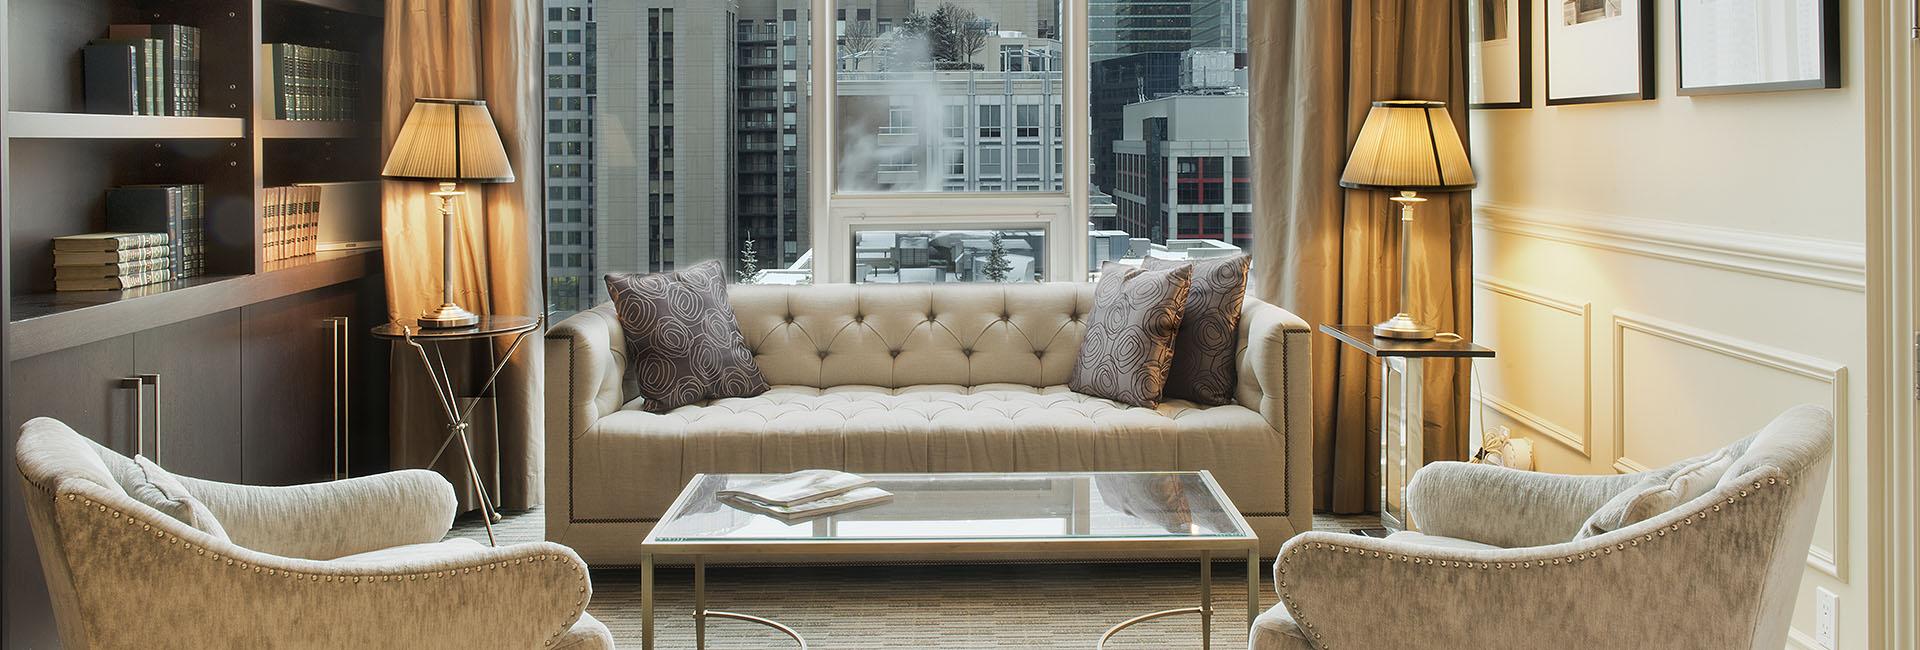 Penthouse Suite Presidential Suite Soho Metropolitan